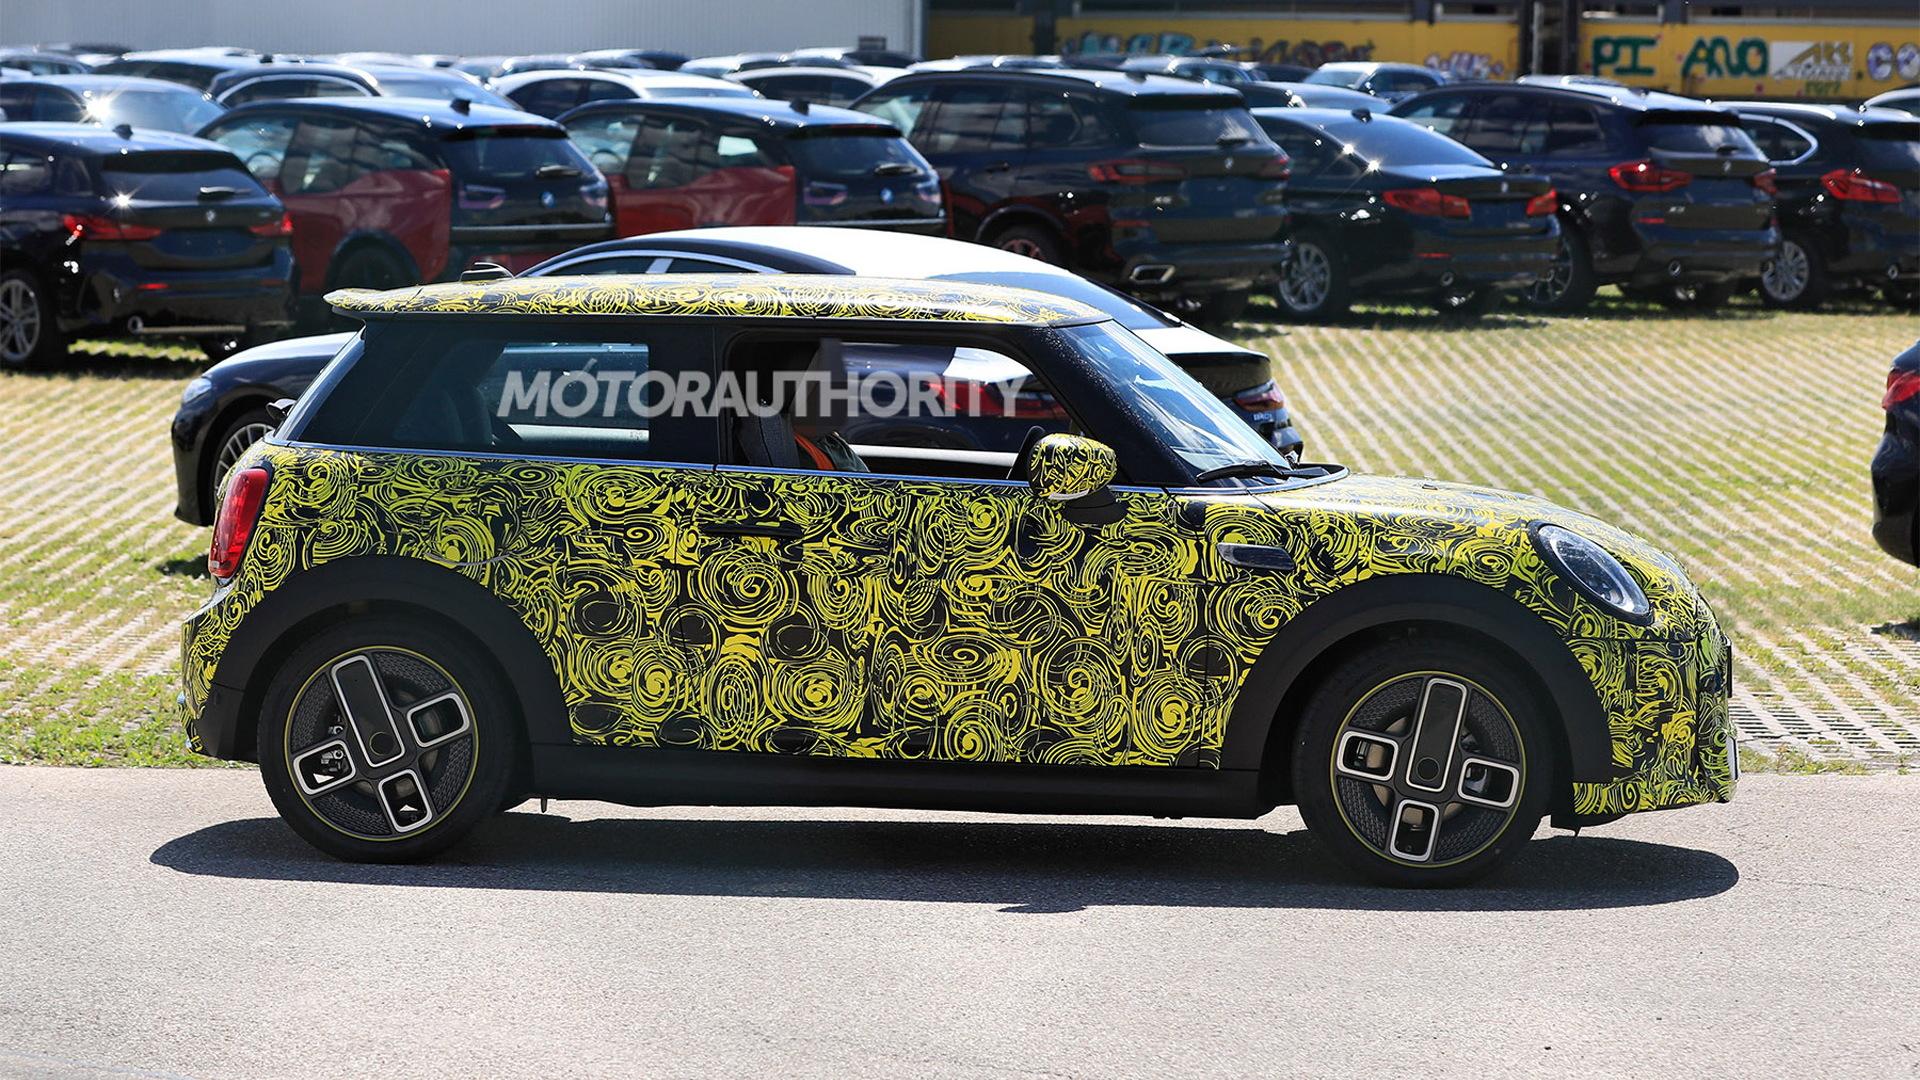 2022 Mini Cooper SE facelift spy shots - Photo credit:S. Baldauf/SB-Medien